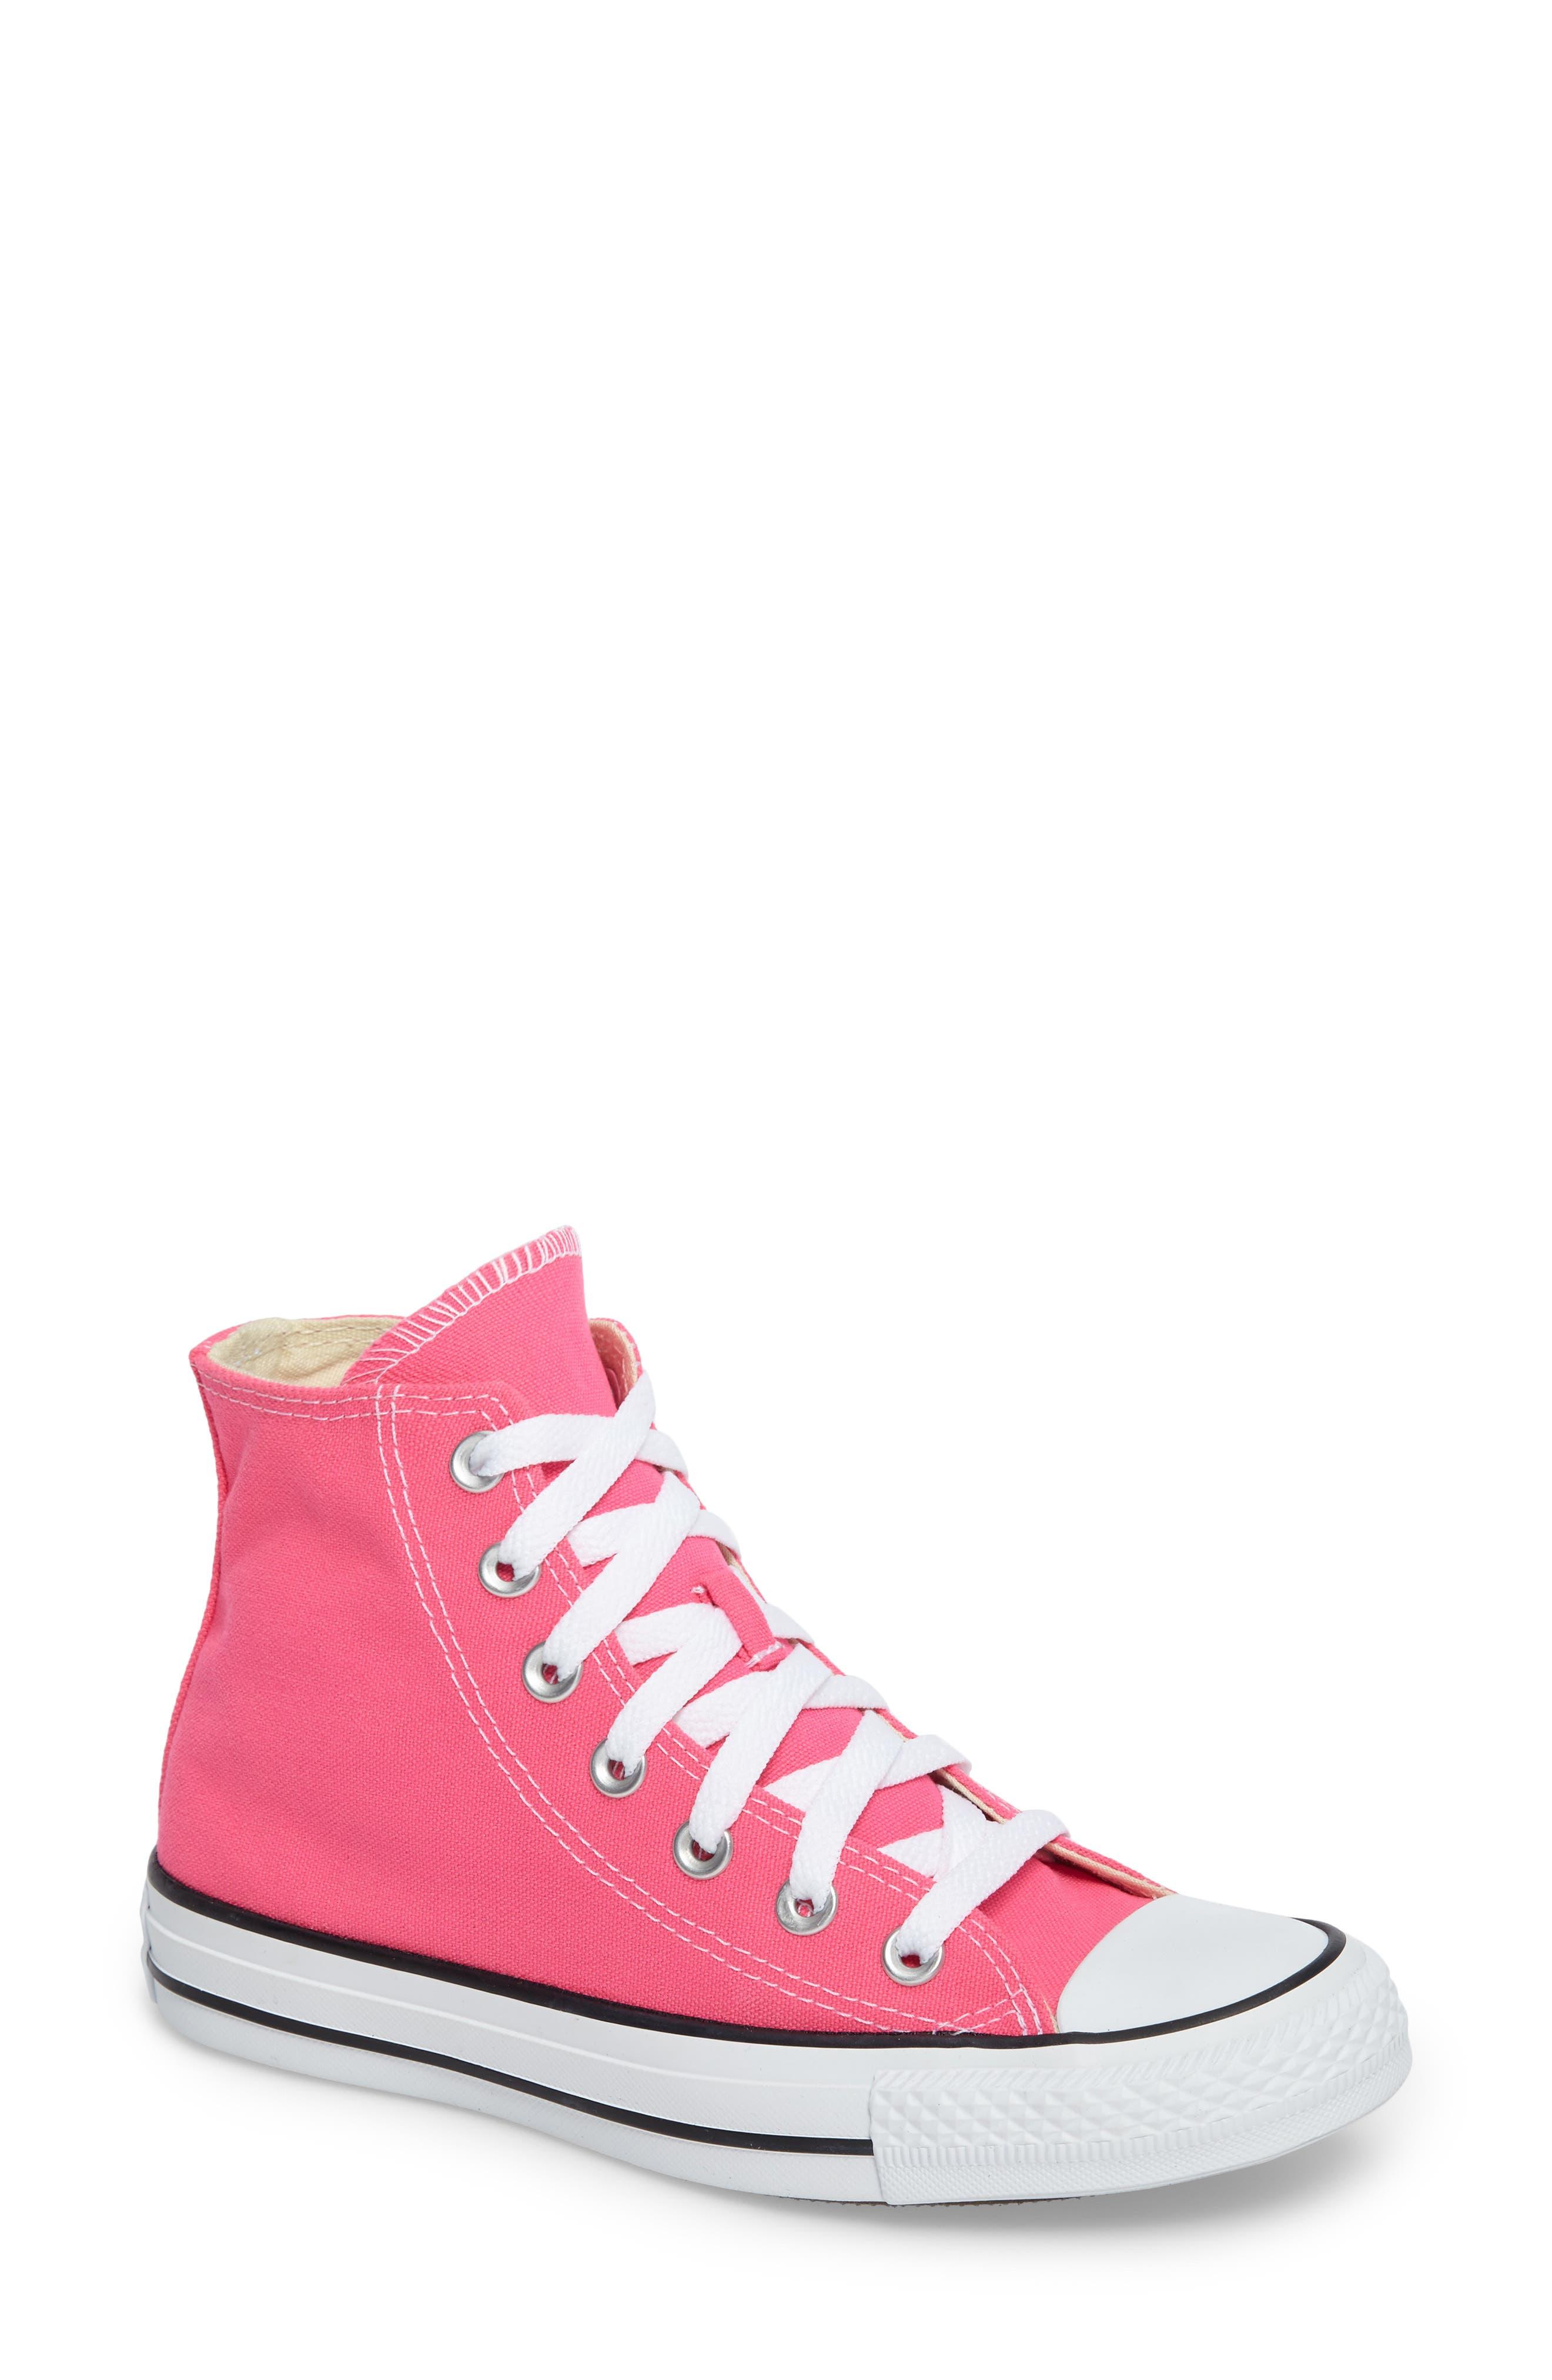 Chuck Taylor<sup>®</sup> All Star<sup>®</sup> Seasonal Hi Sneaker,                         Main,                         color, Petal Pink